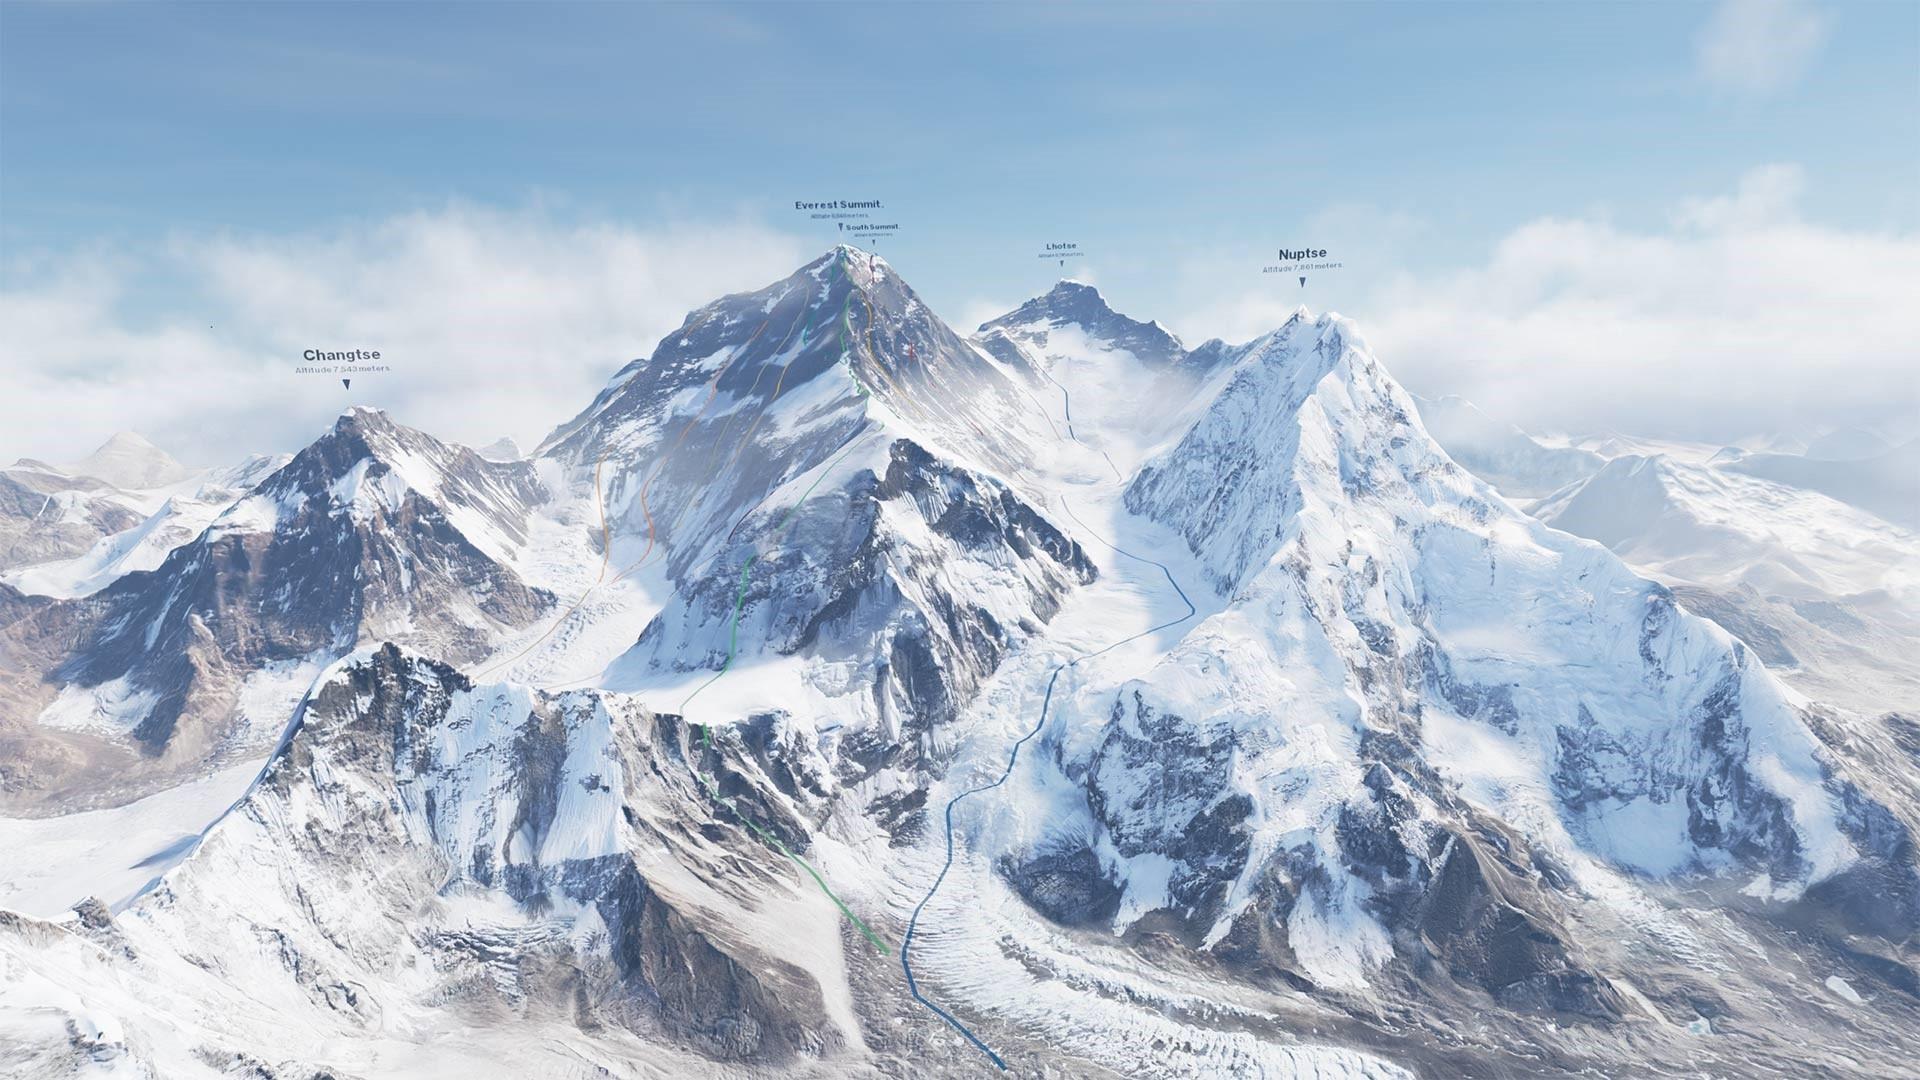 Everest Image